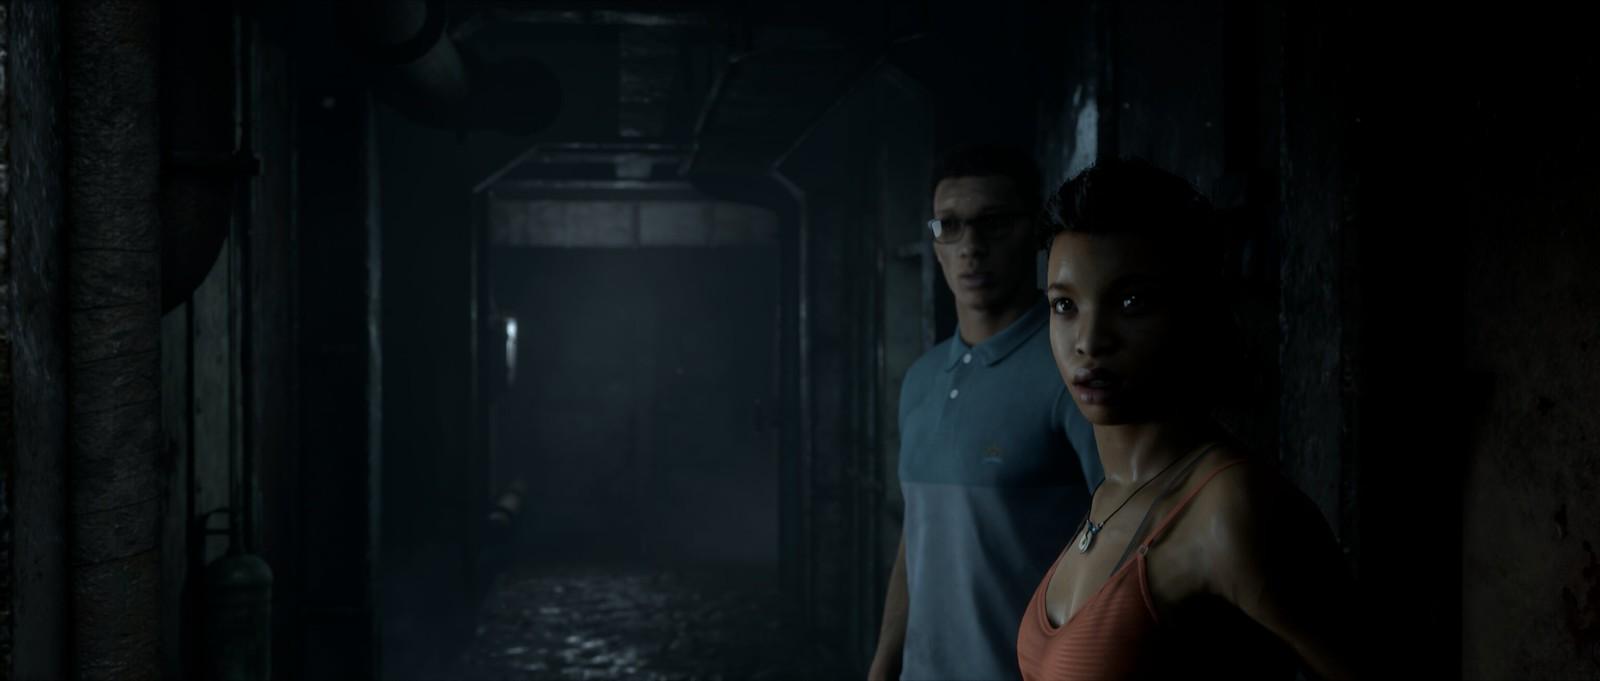 PlayStation's Most Wanted Upcoming PS4 Games of 2019 – PlayStation Blog